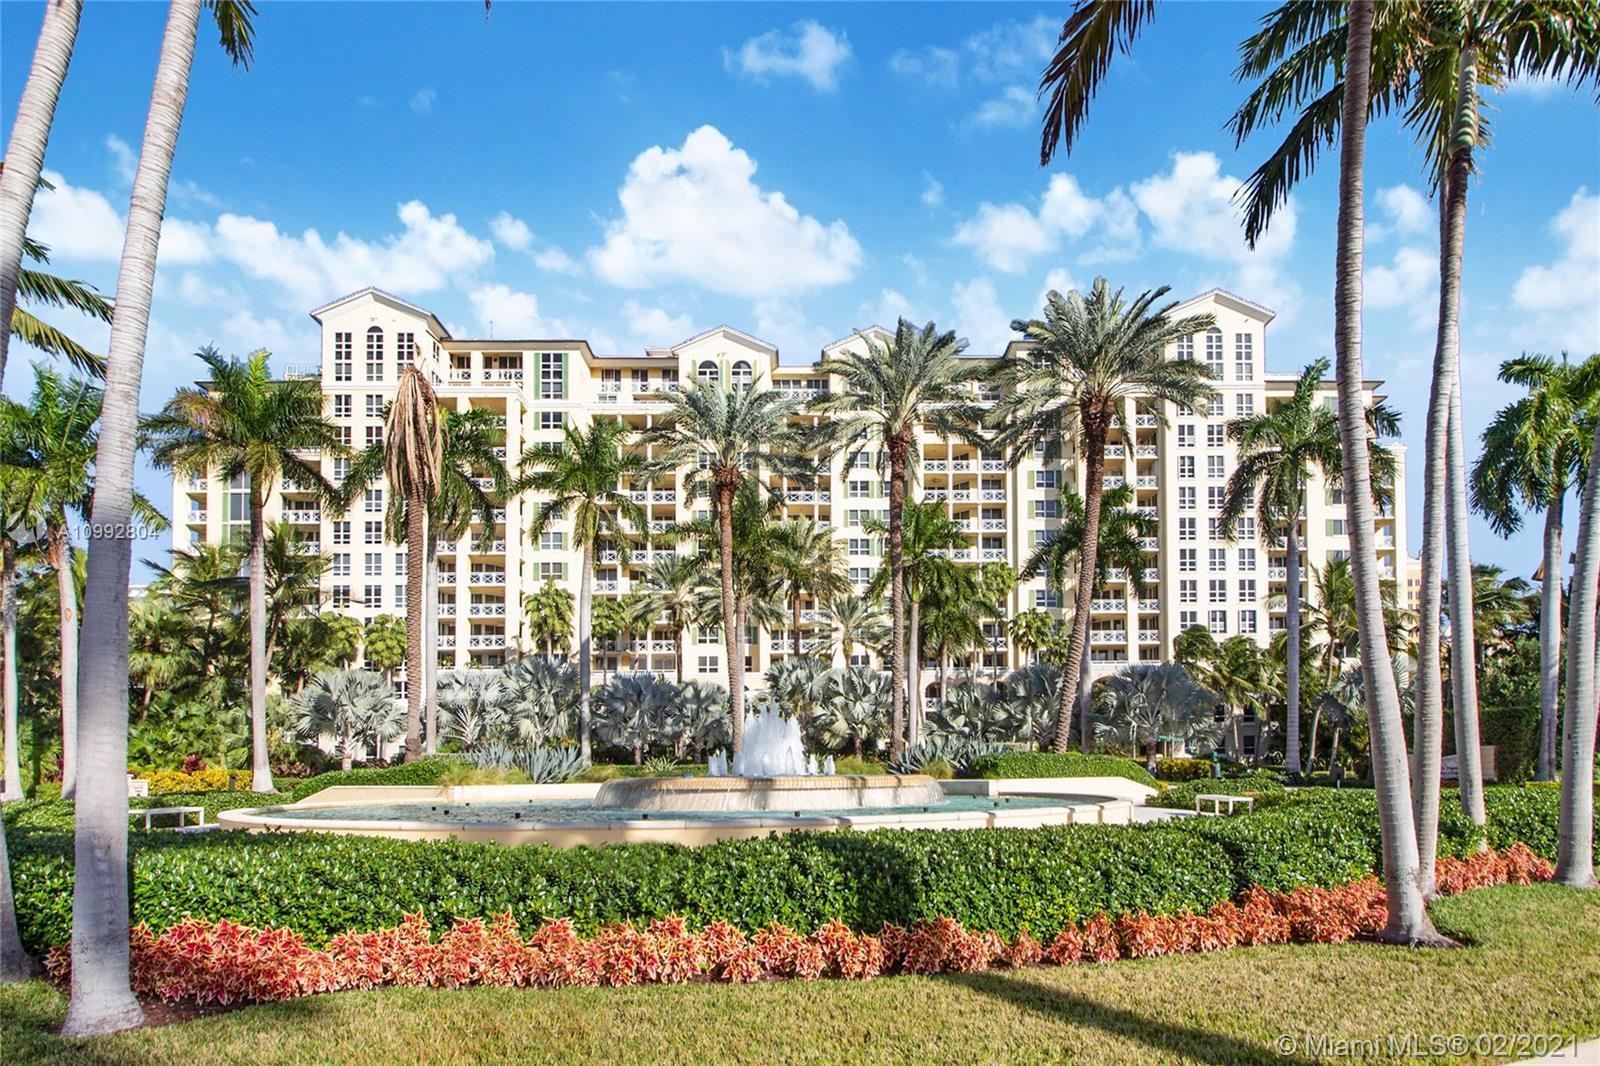 Grand Bay Residences #1006 - 445 Grand Bay Dr #1006, Key Biscayne, FL 33149